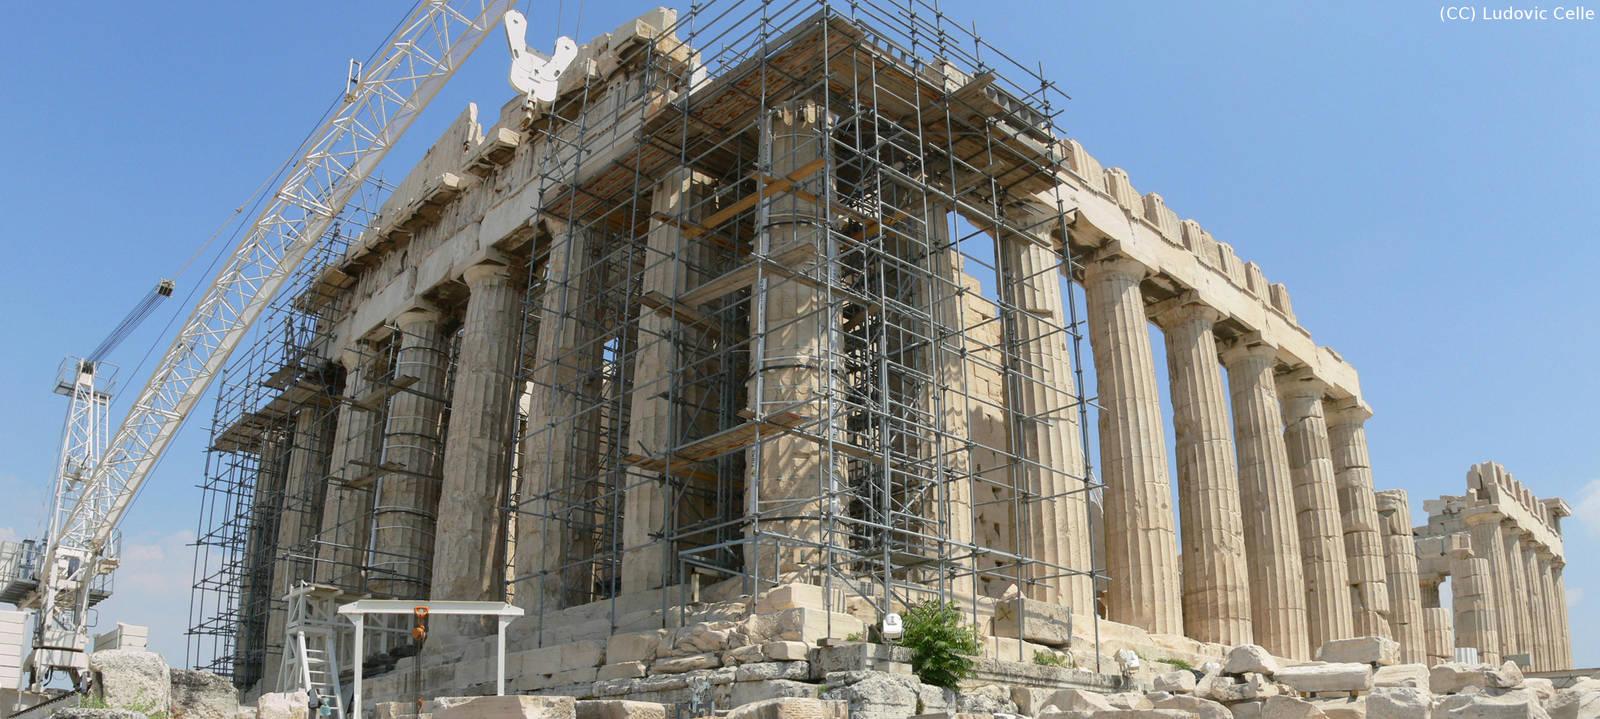 Greece - Rebuilding the Parthenon 02 (panorama) by Ludo38